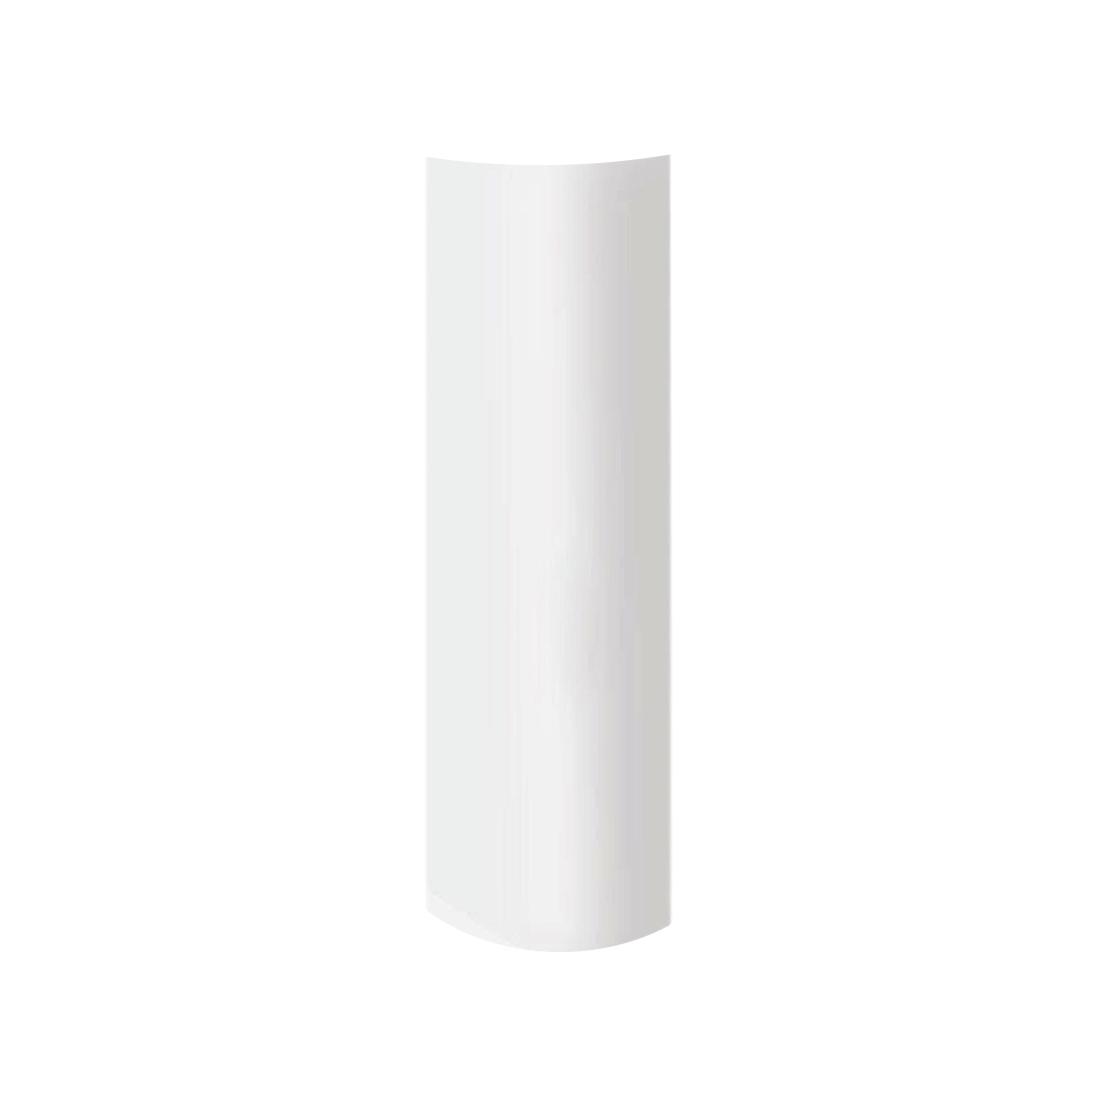 Kerovit 307 Half Pedestal